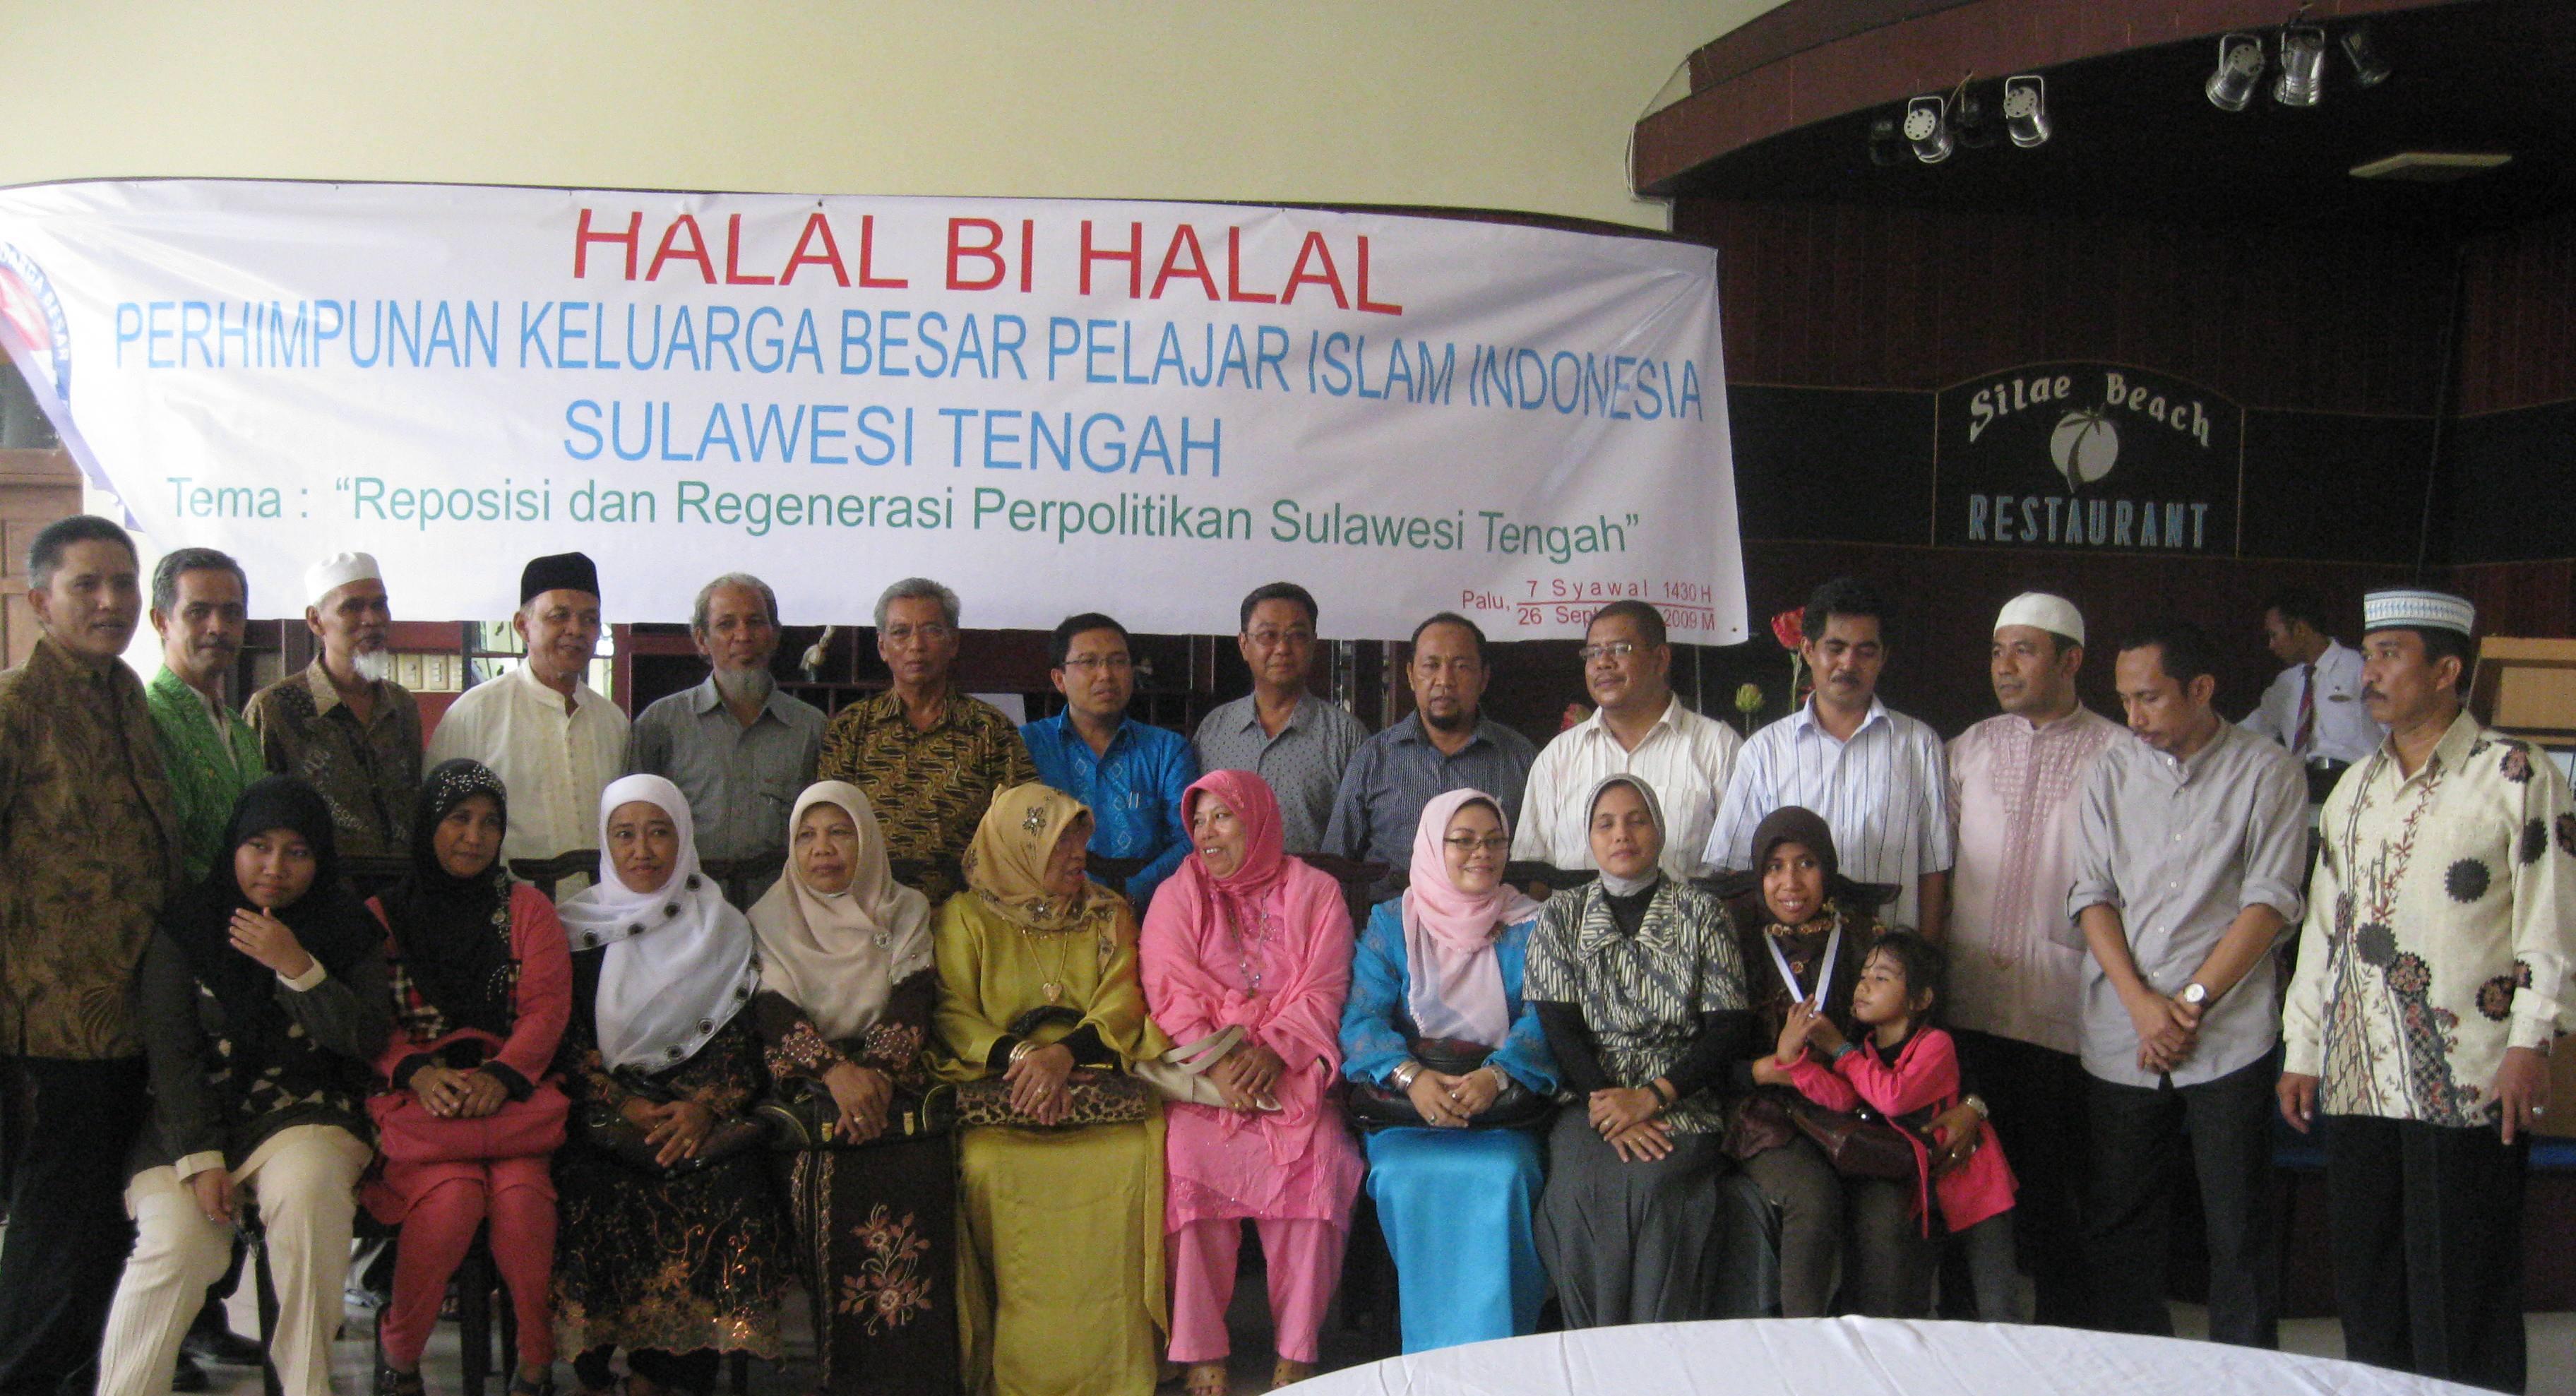 Keluarga Besar Perhimpunan PII Sul-Teng